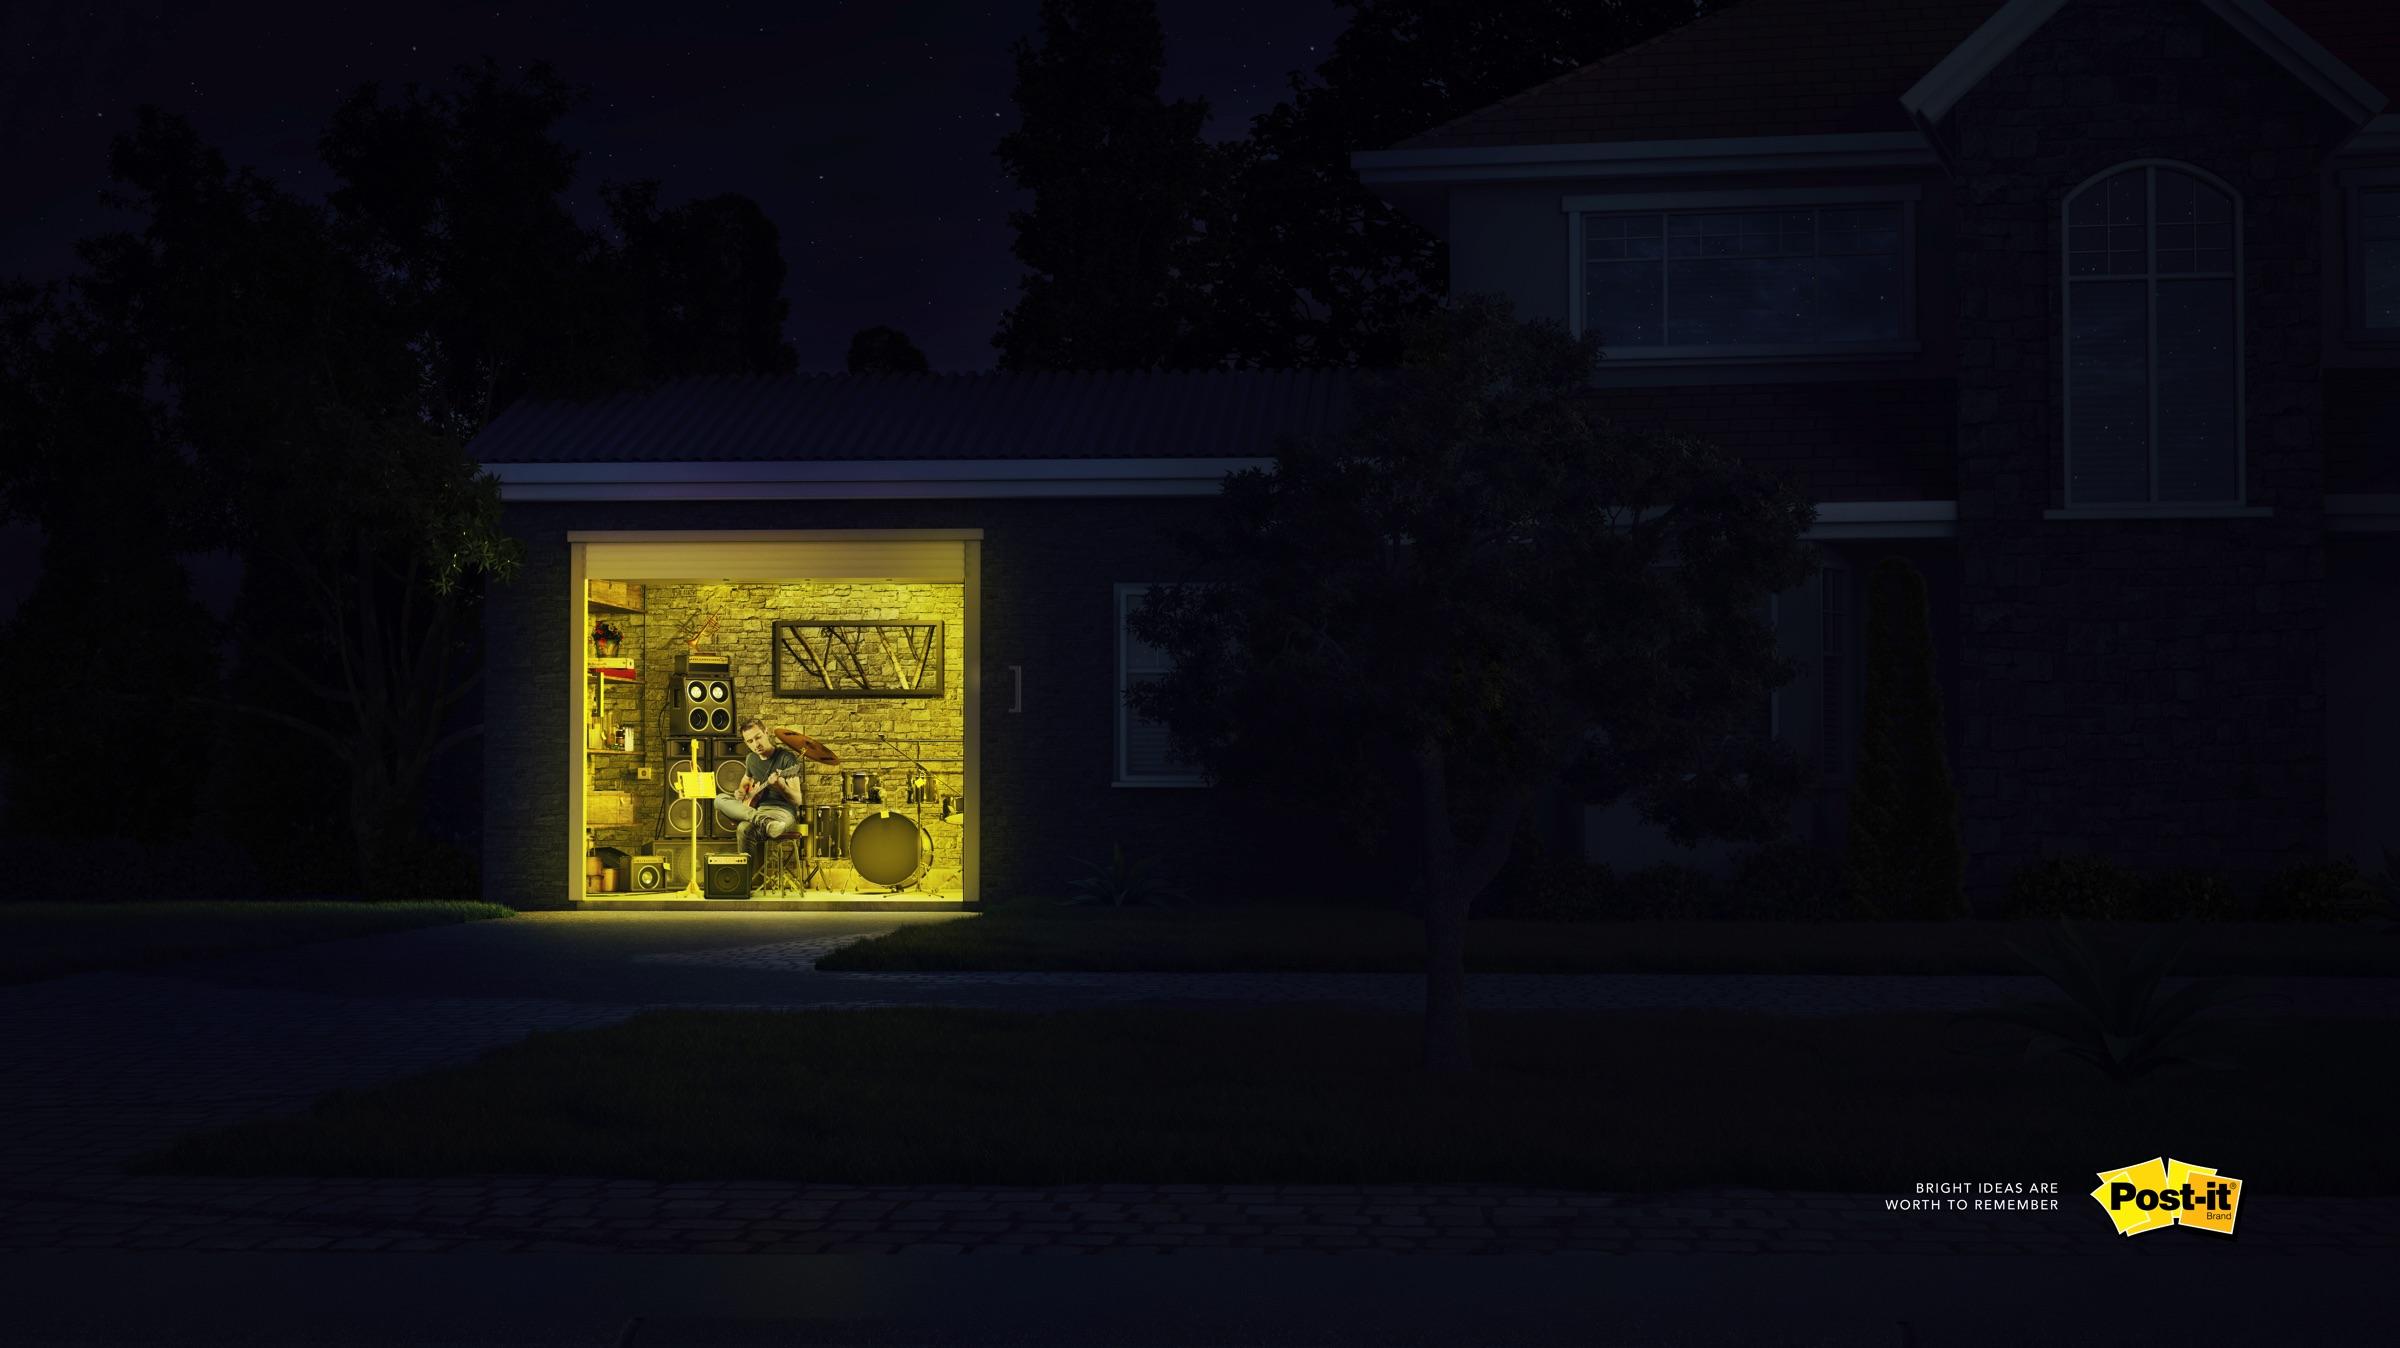 Post It - Bright Ideas (Musician)